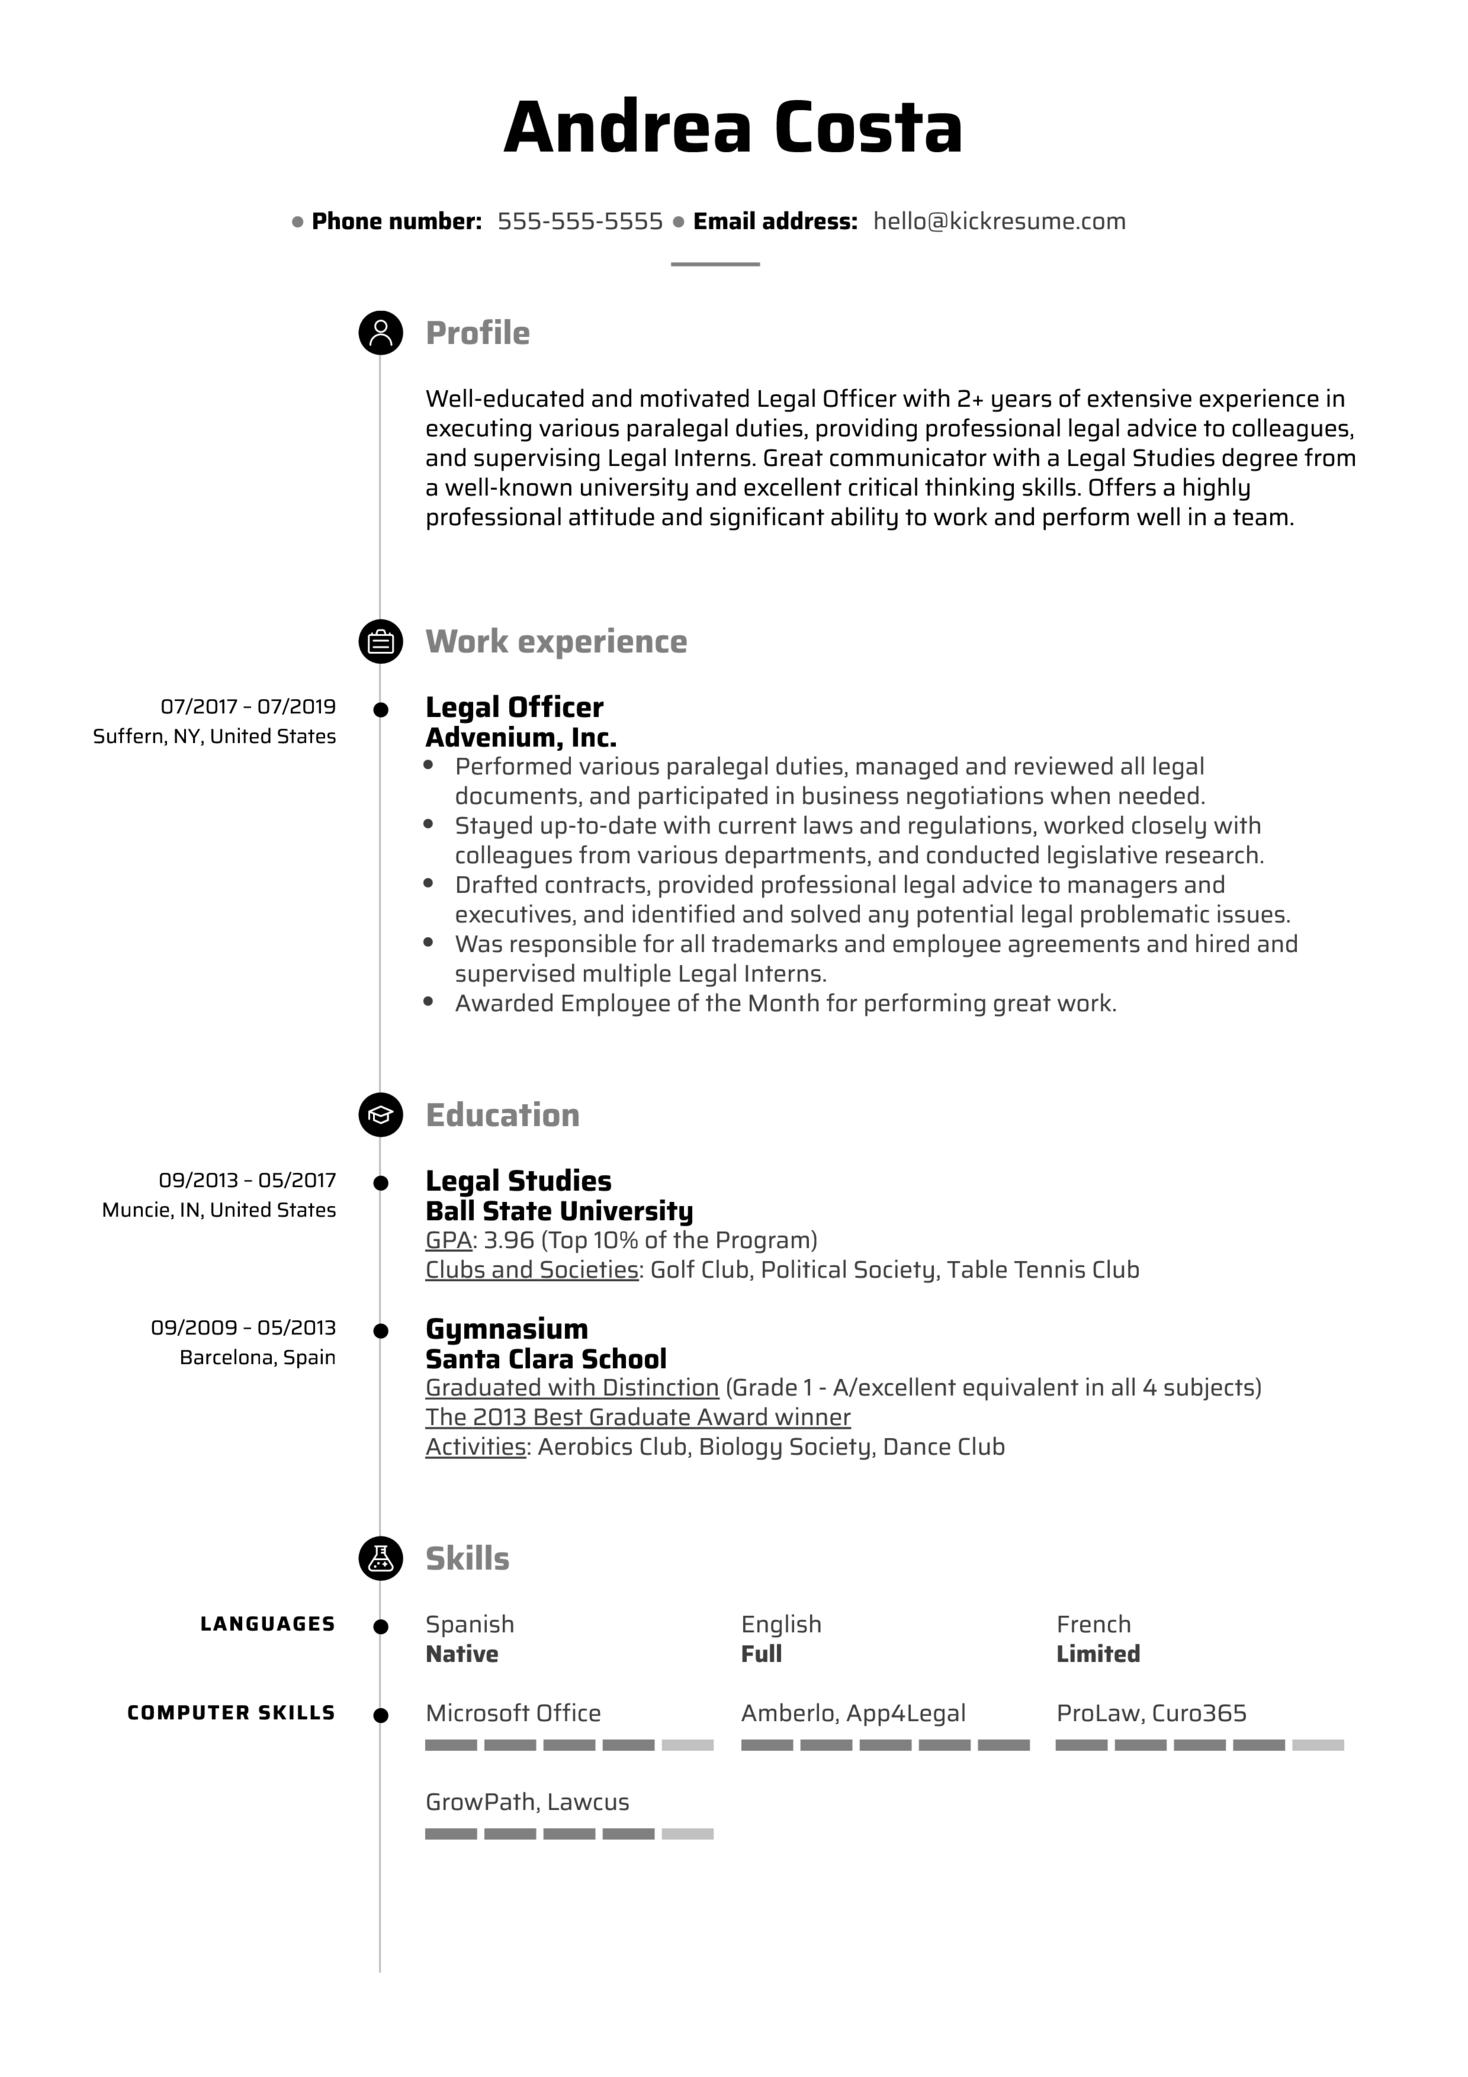 Legal Officer Resume Sample (Parte 1)